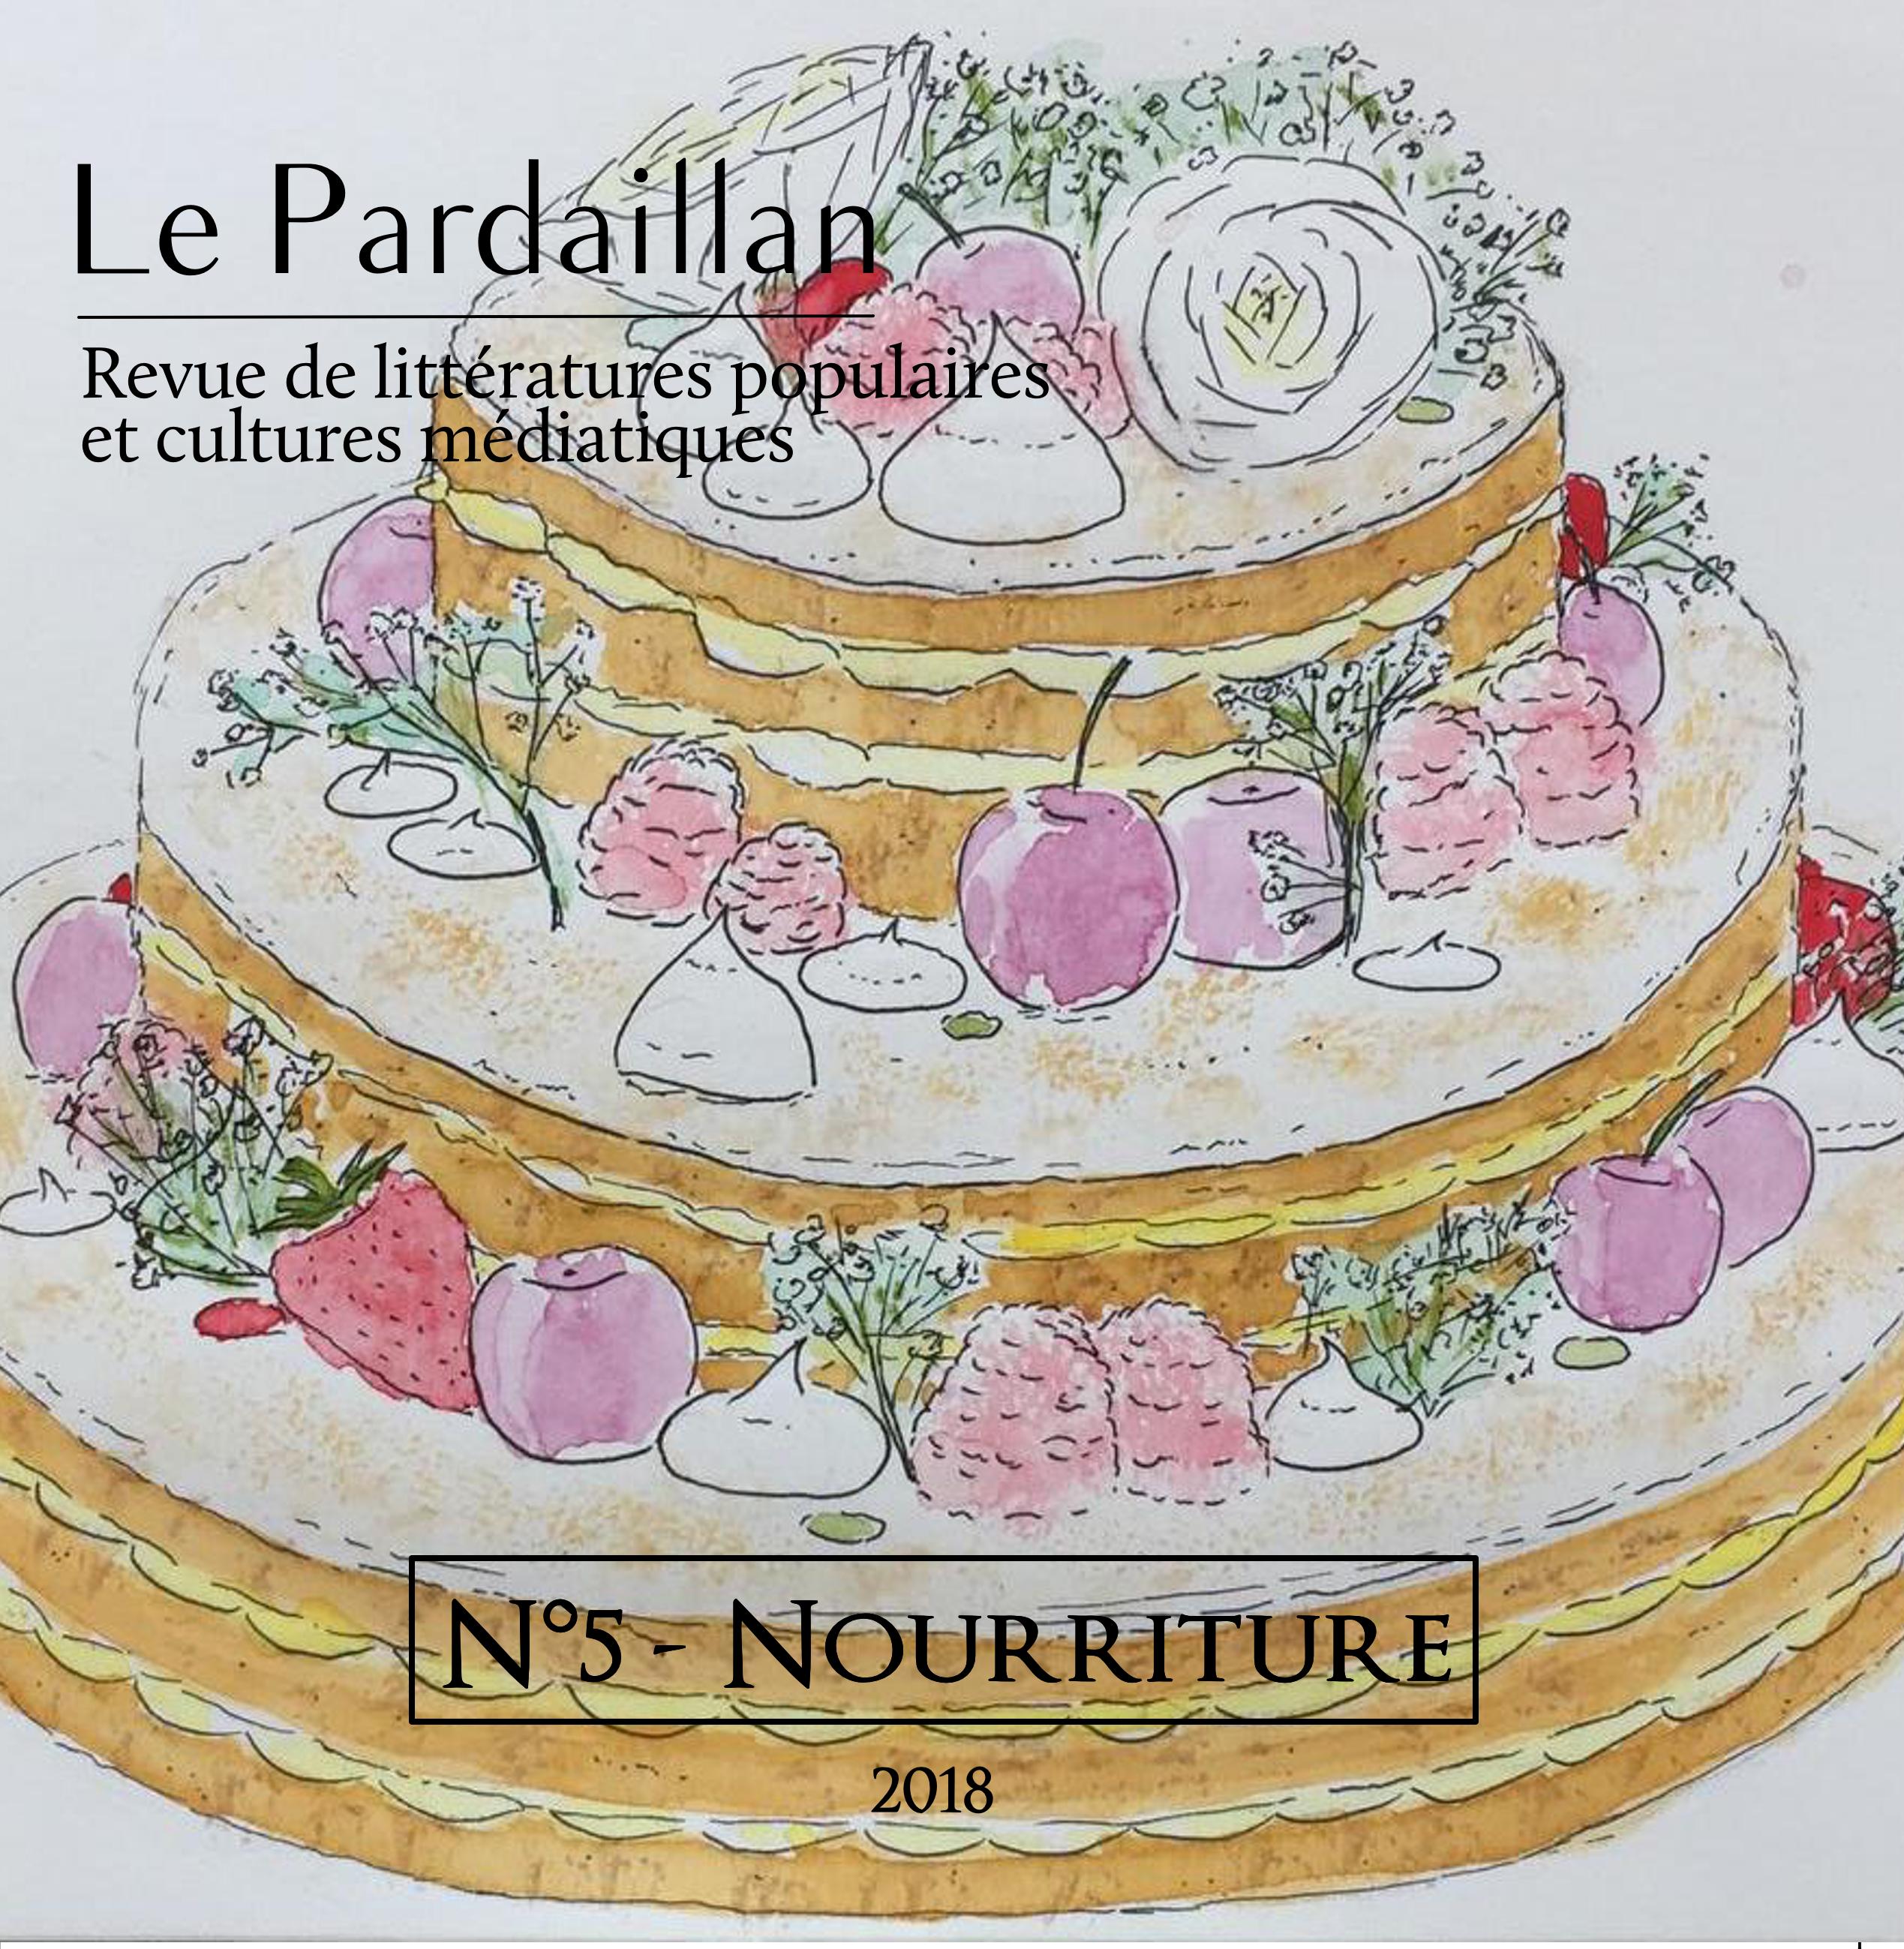 Le Pardaillan N°5 - Nourriture Image